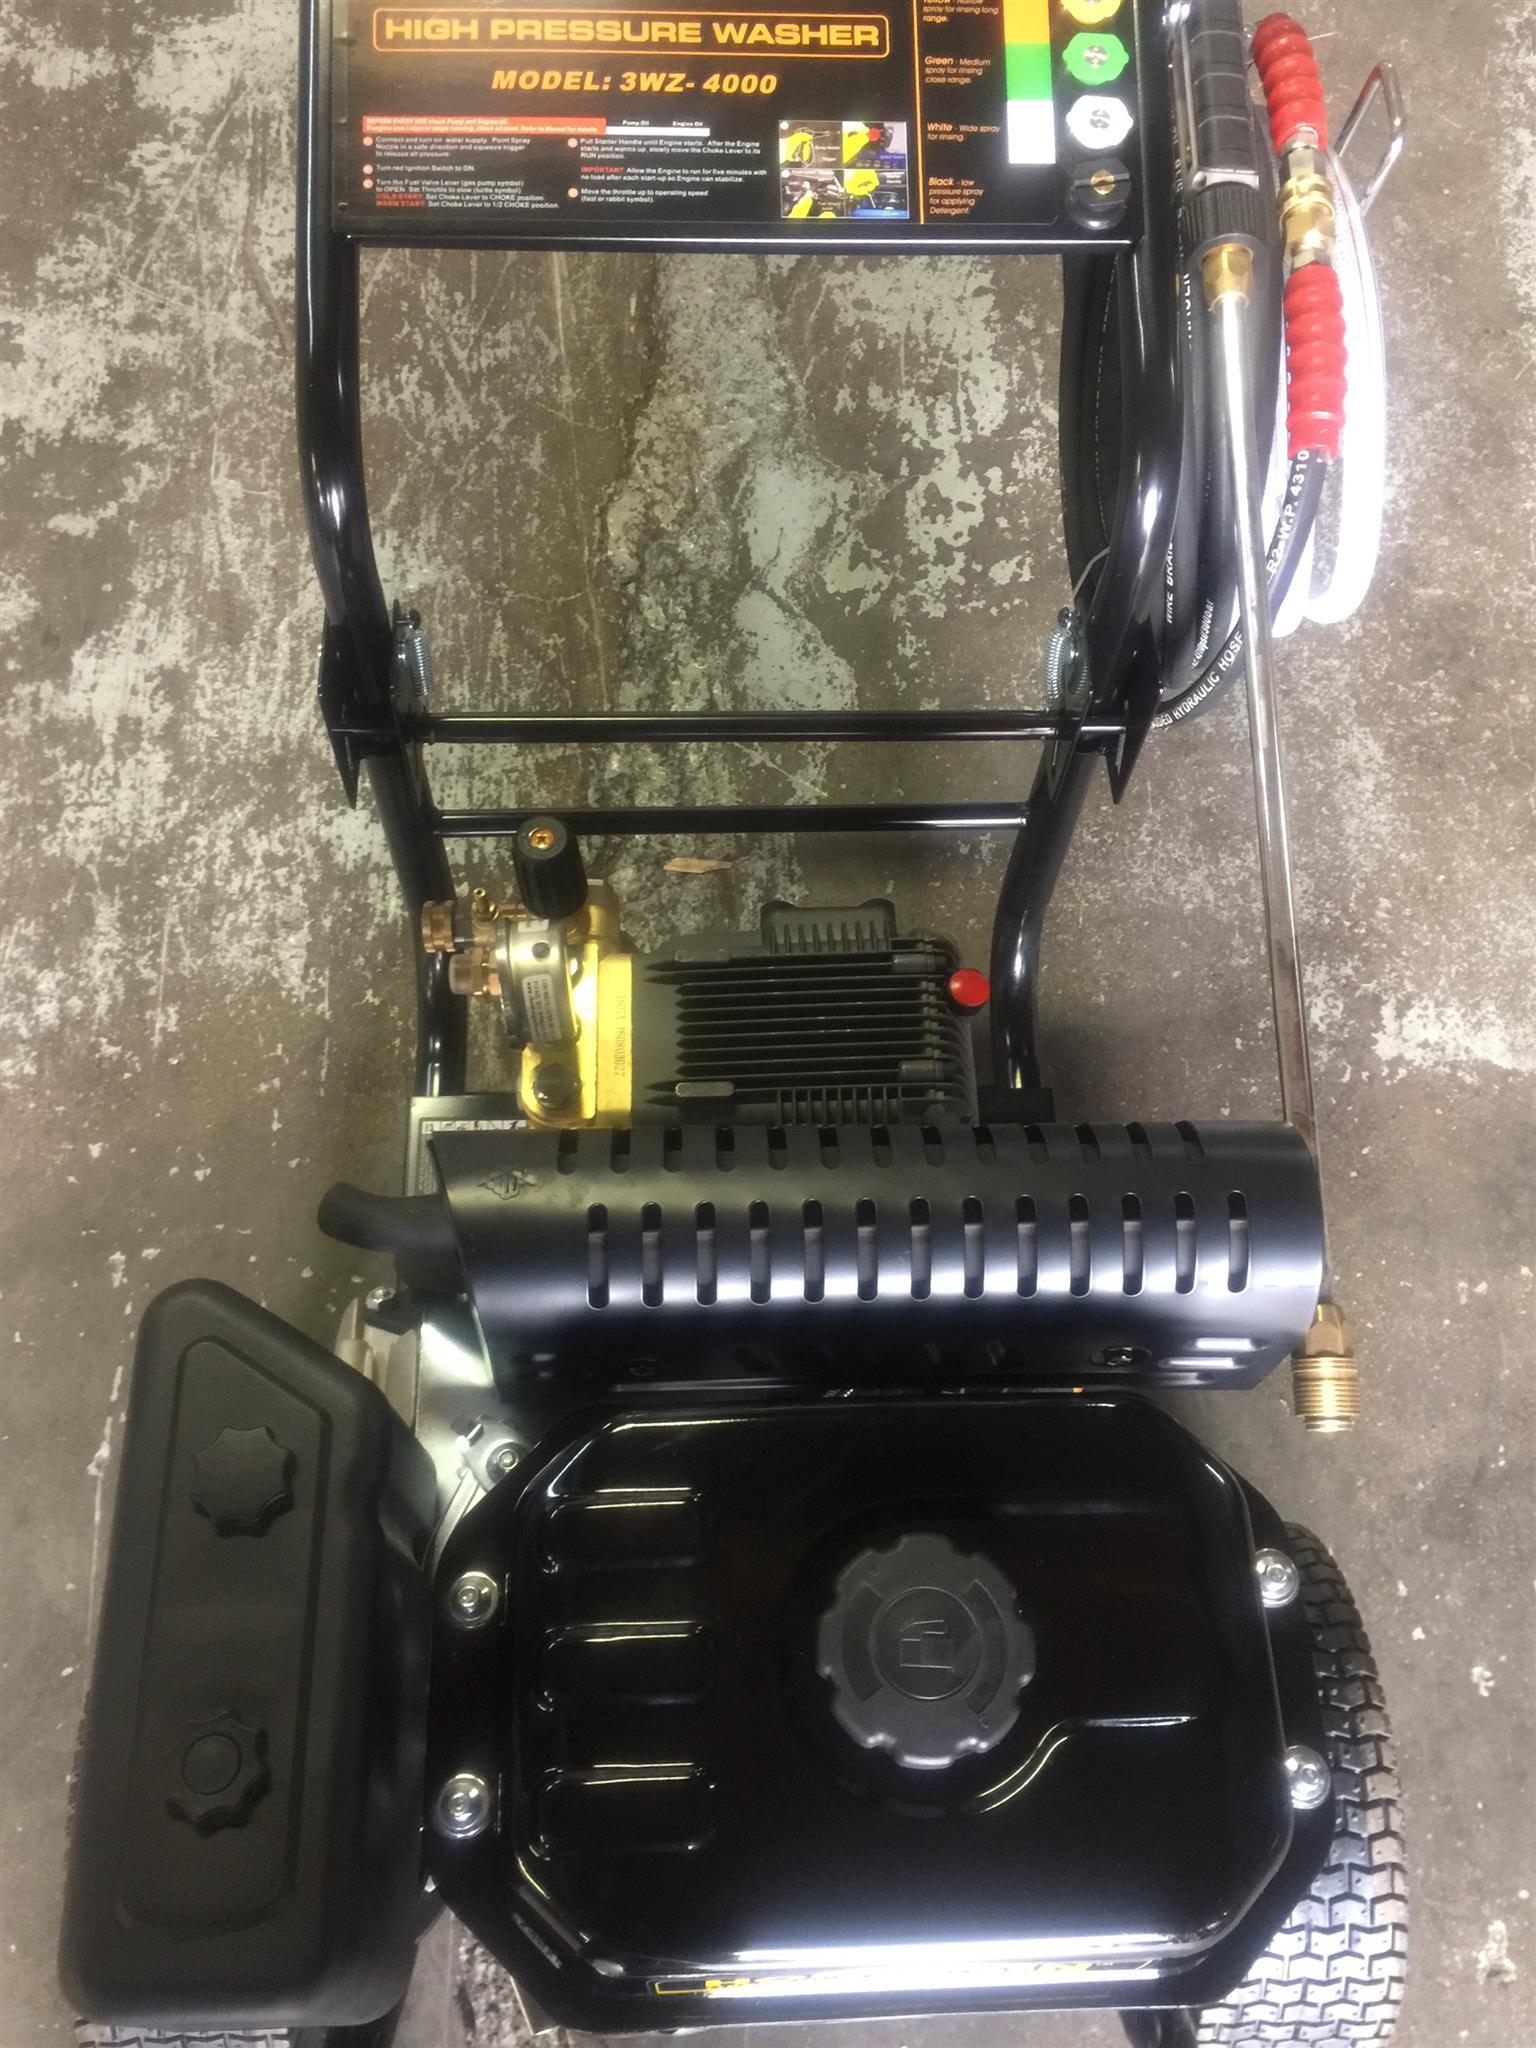 248 bar petrol high pressure washer specials